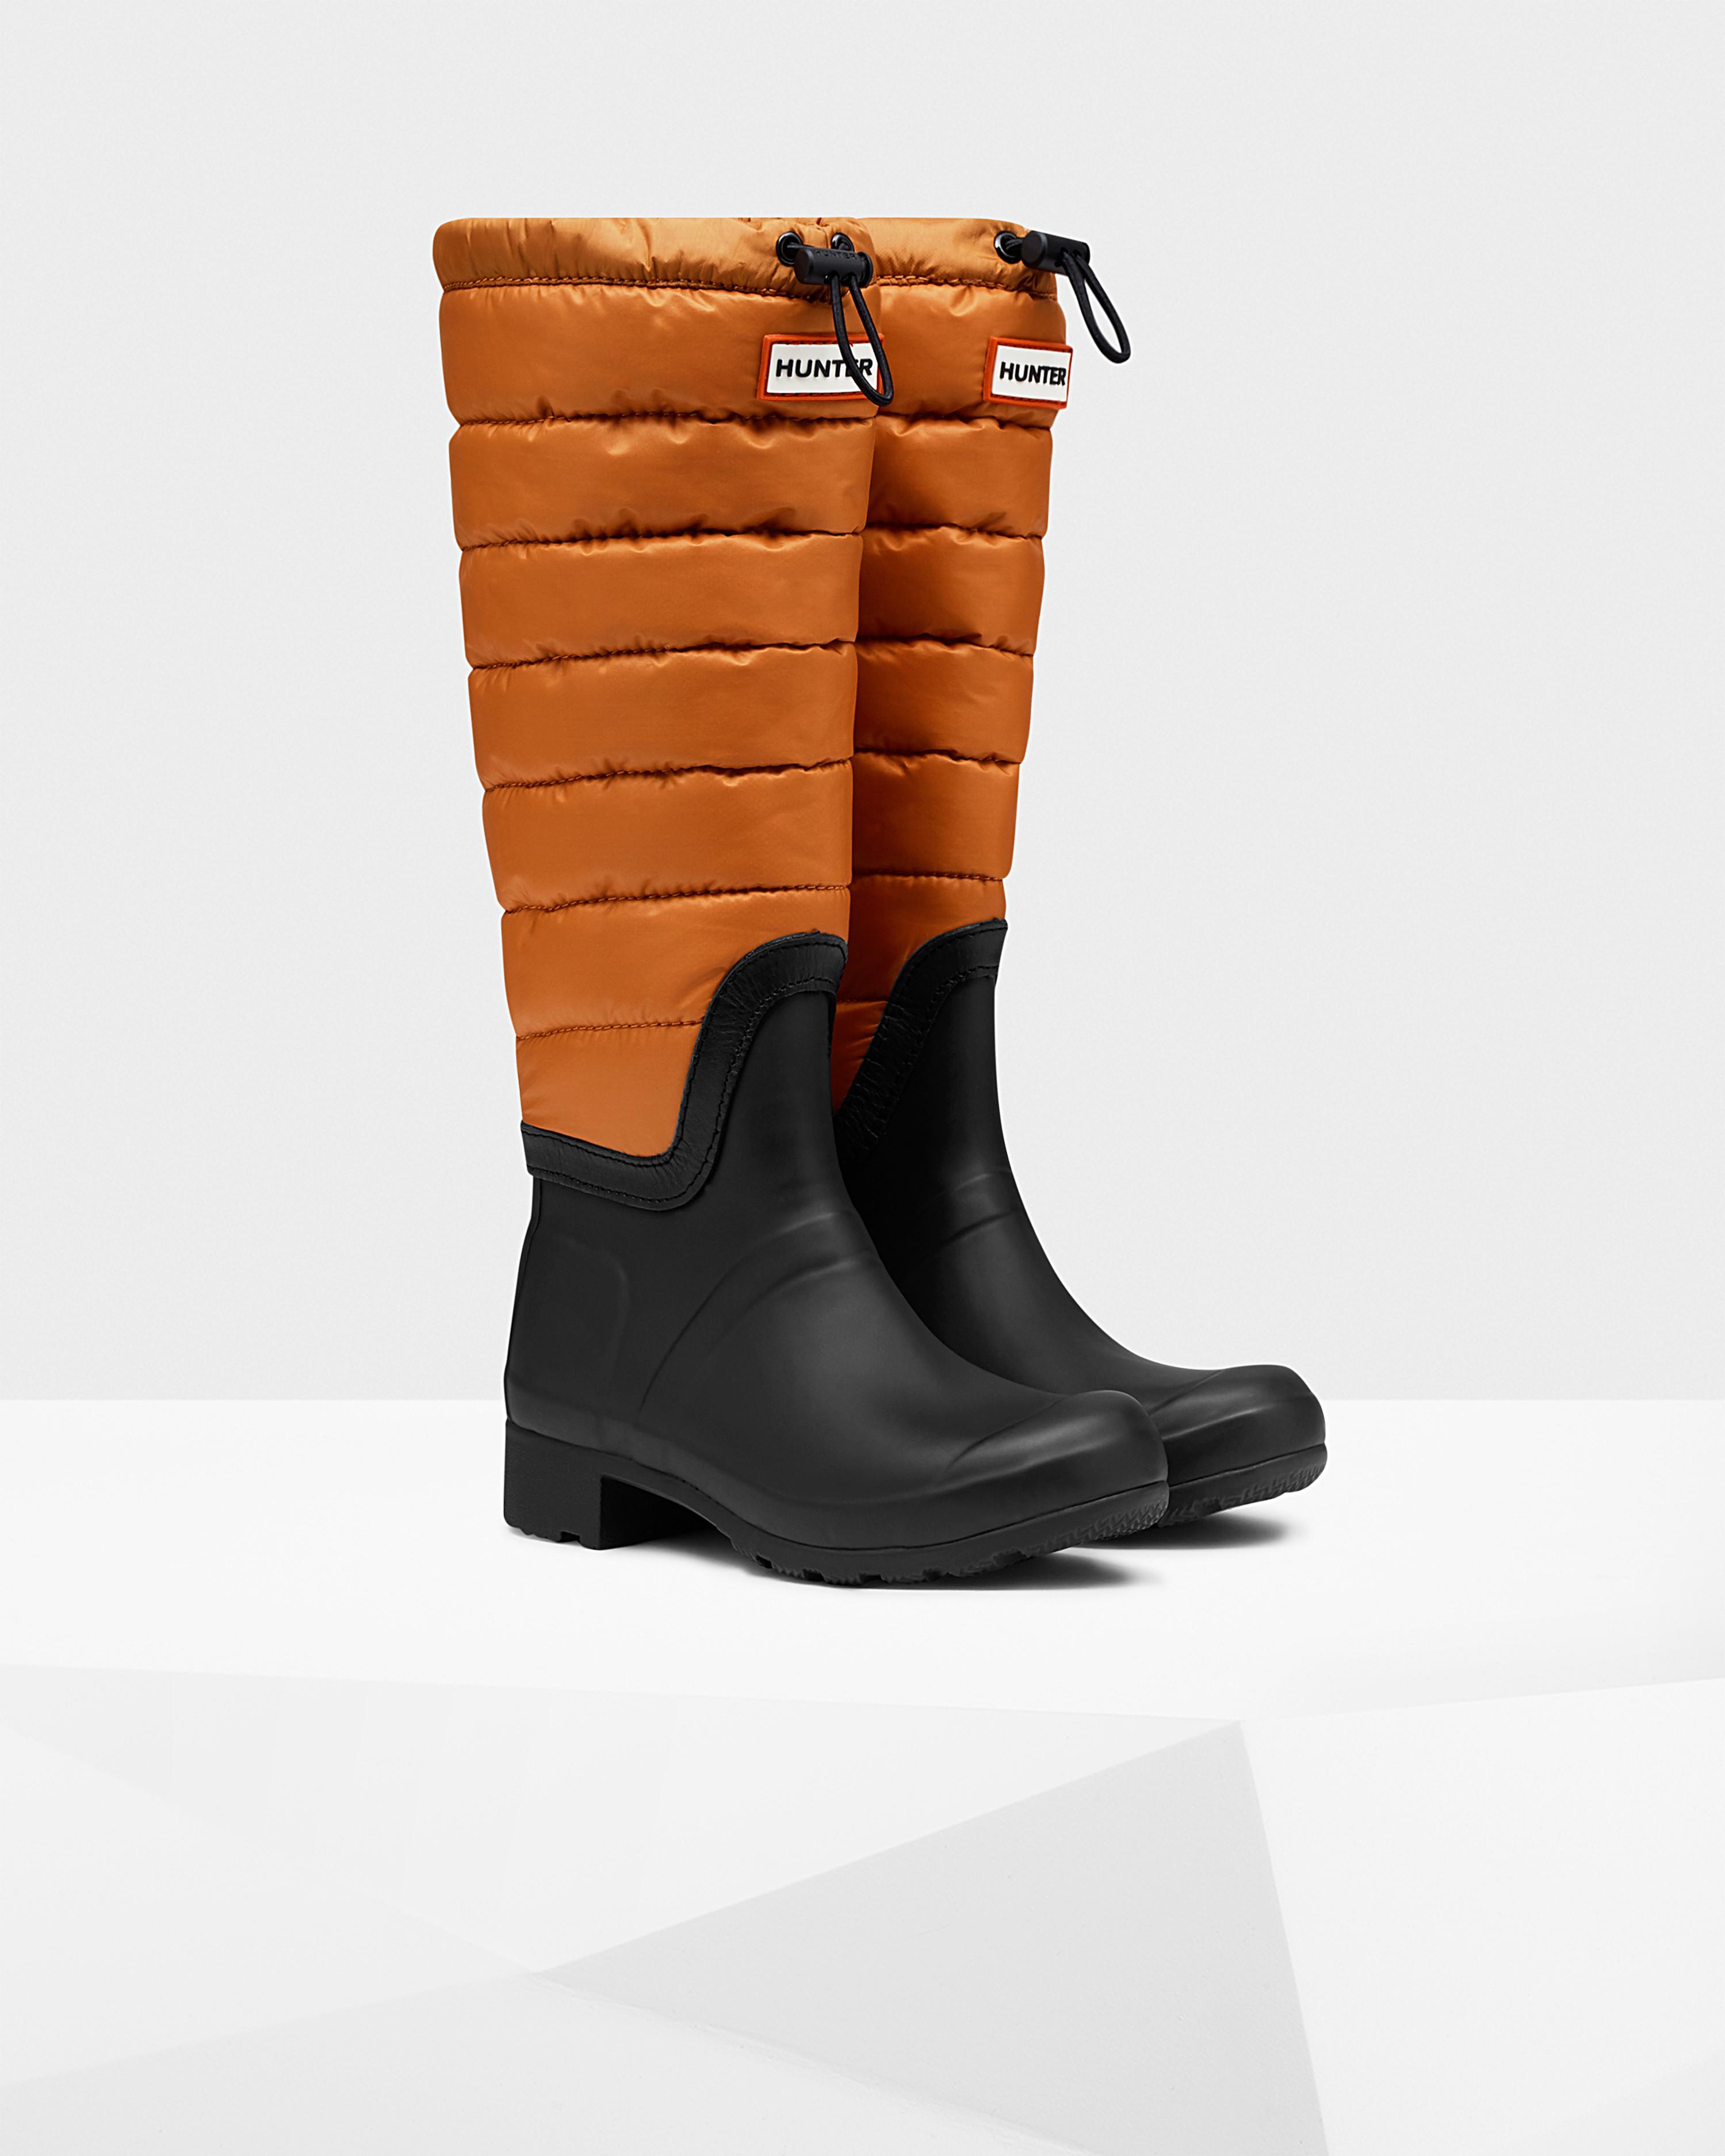 Lyst - Hunter Womens Original Tall Quilted Leg Rain Boots In Orange